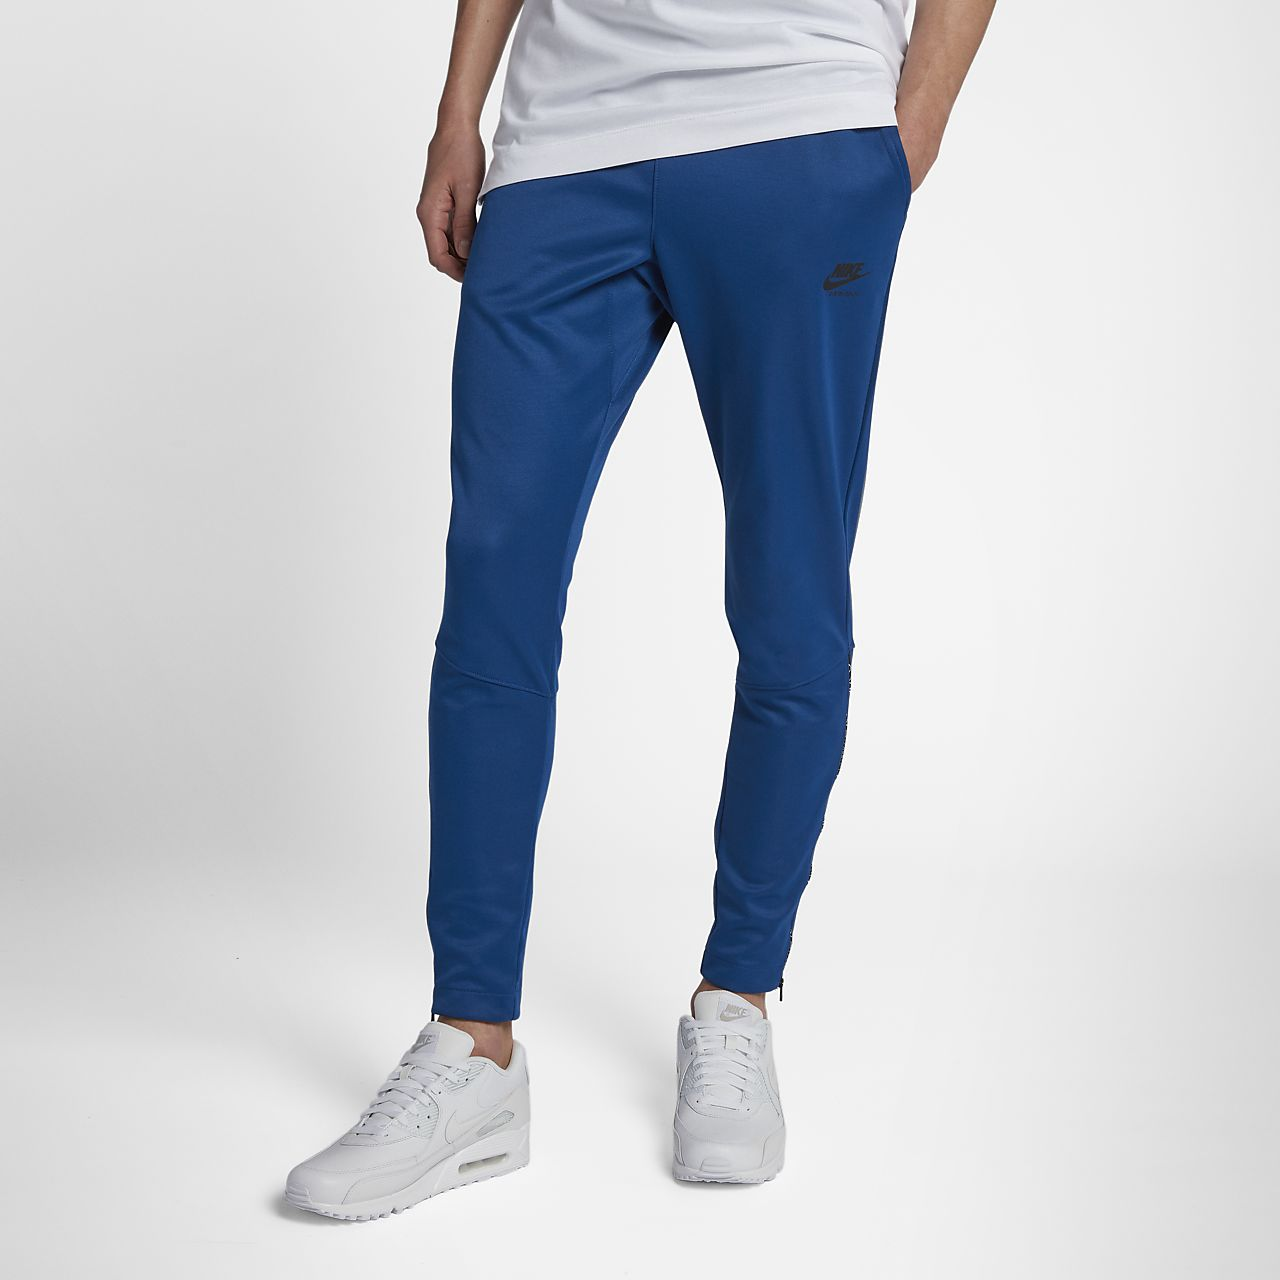 ... Pantalon de jogging Nike Sportswear Air Max pour Homme